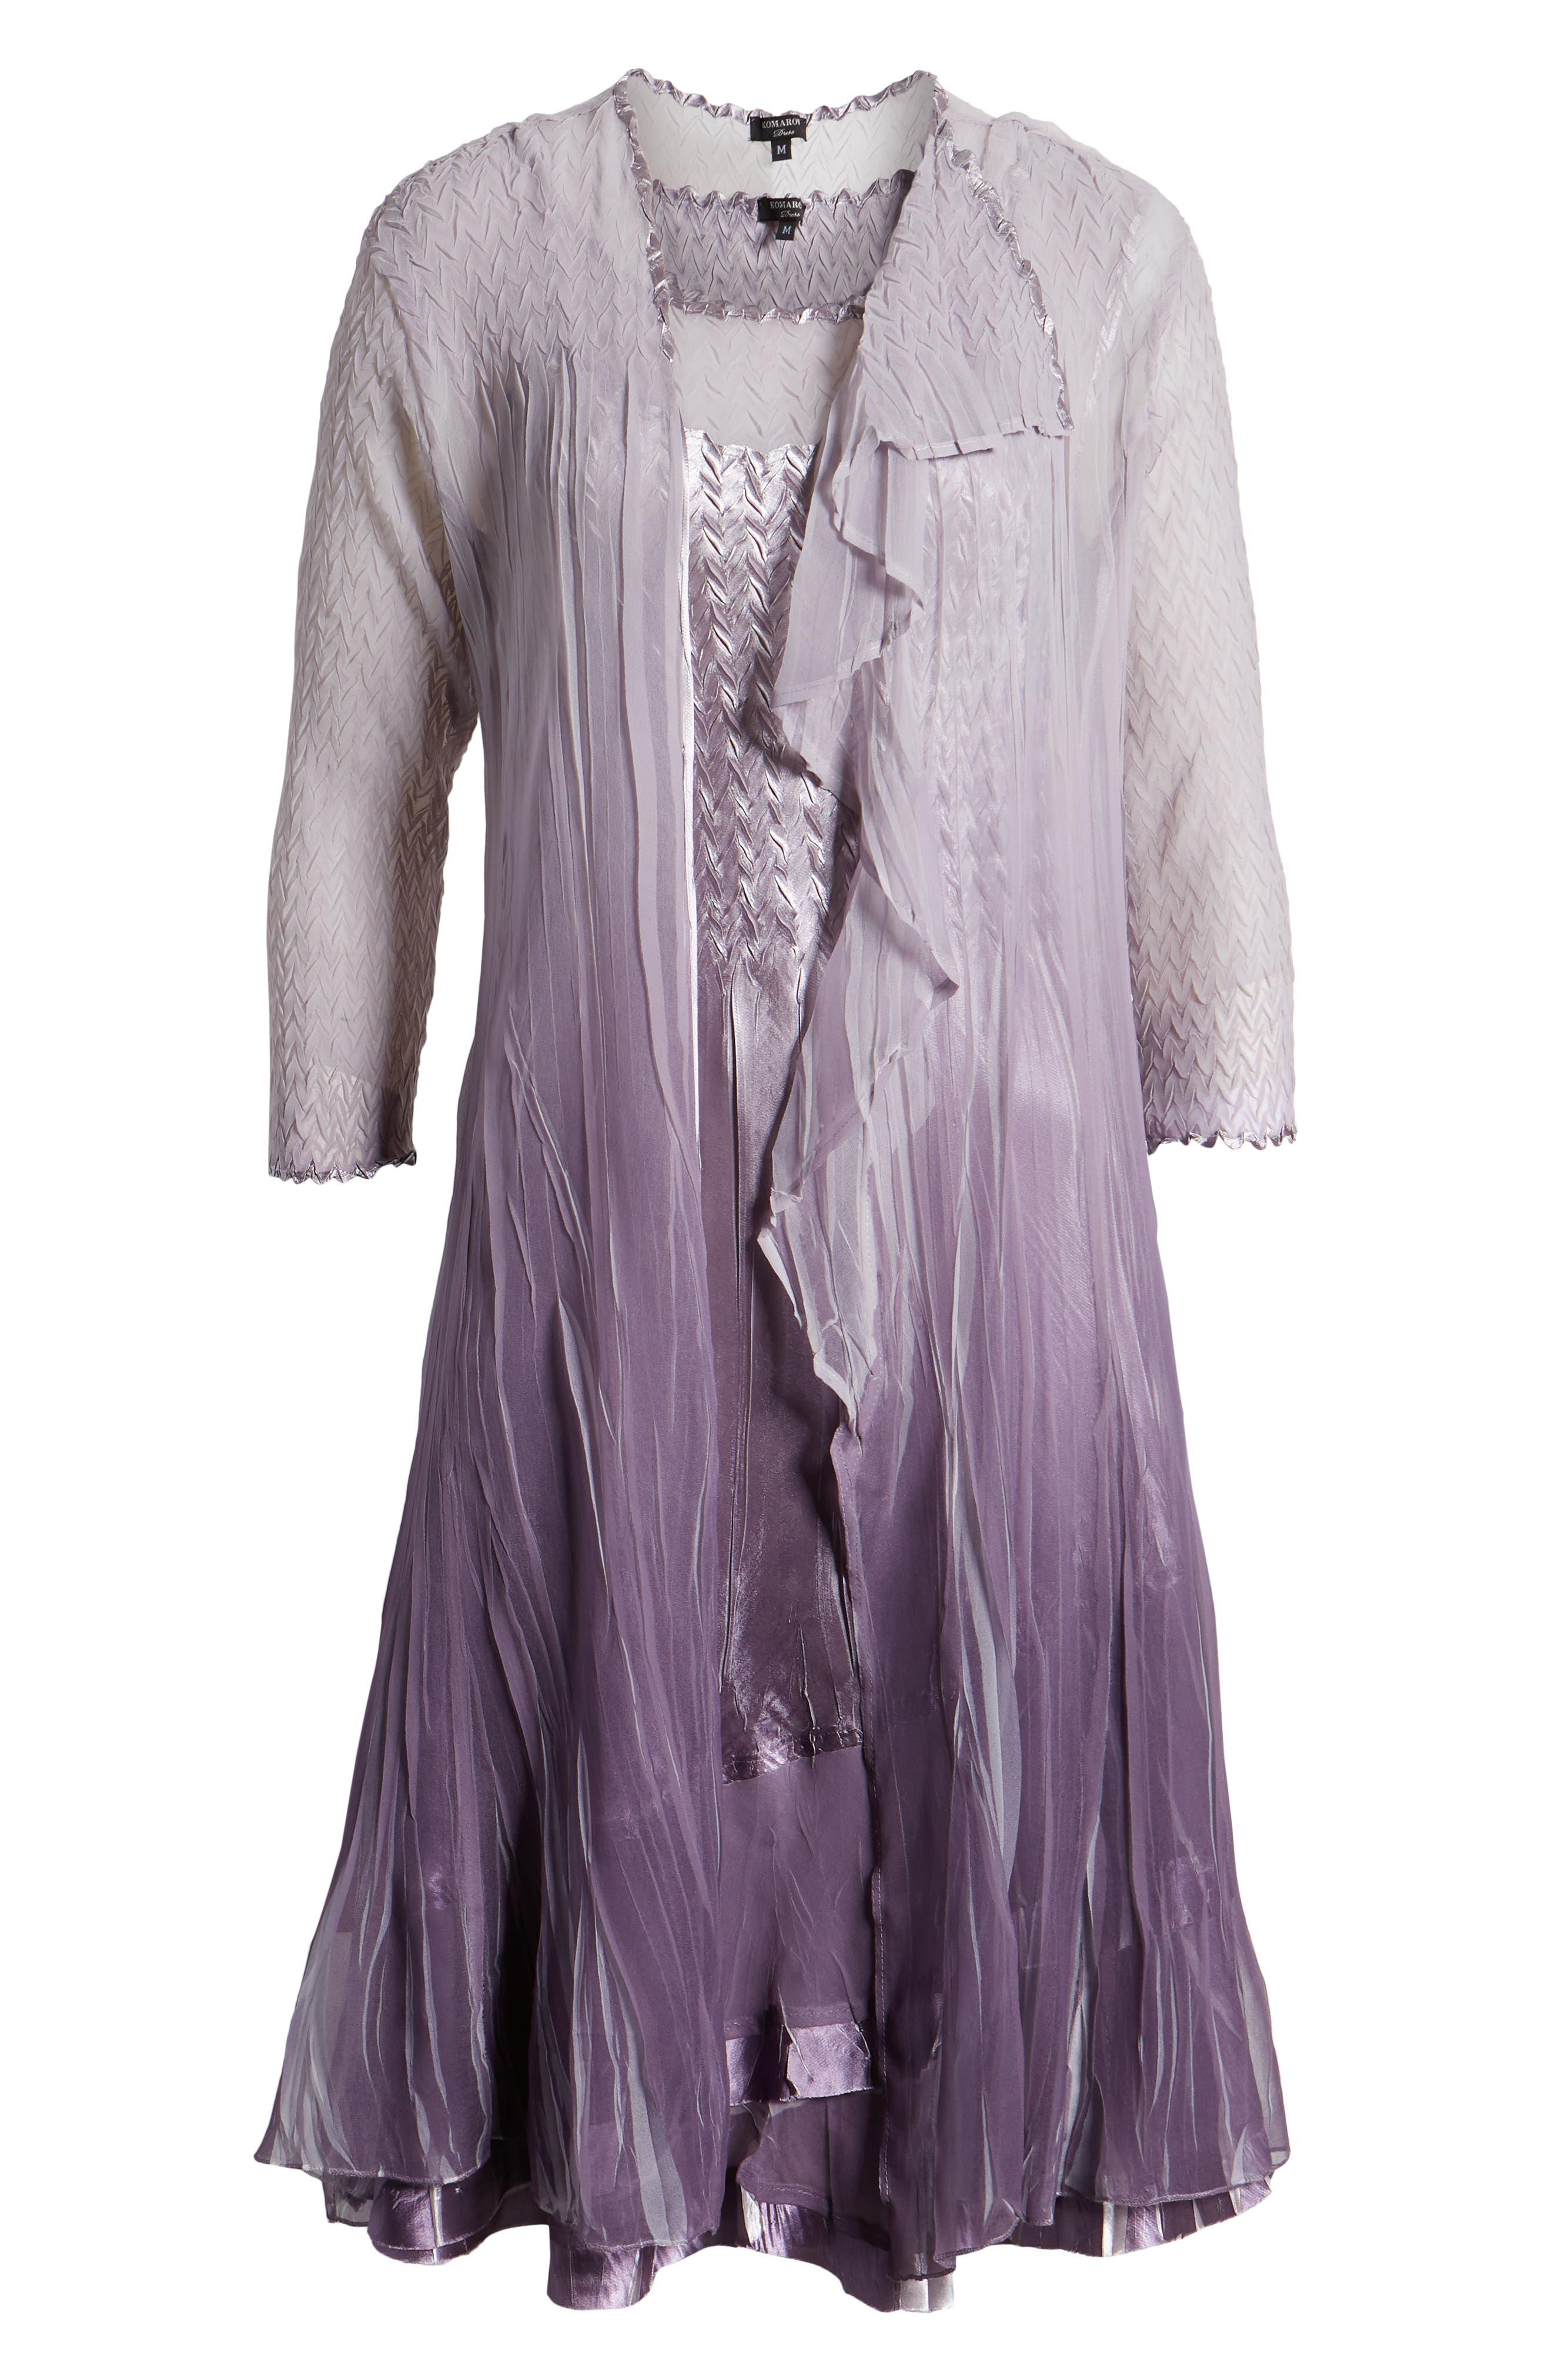 KOMAROV, Komorav Charmeuse Dress with Cascade Jacket, Alternate thumbnail 6, color, GREY VIOLET ORCHID OMBRE